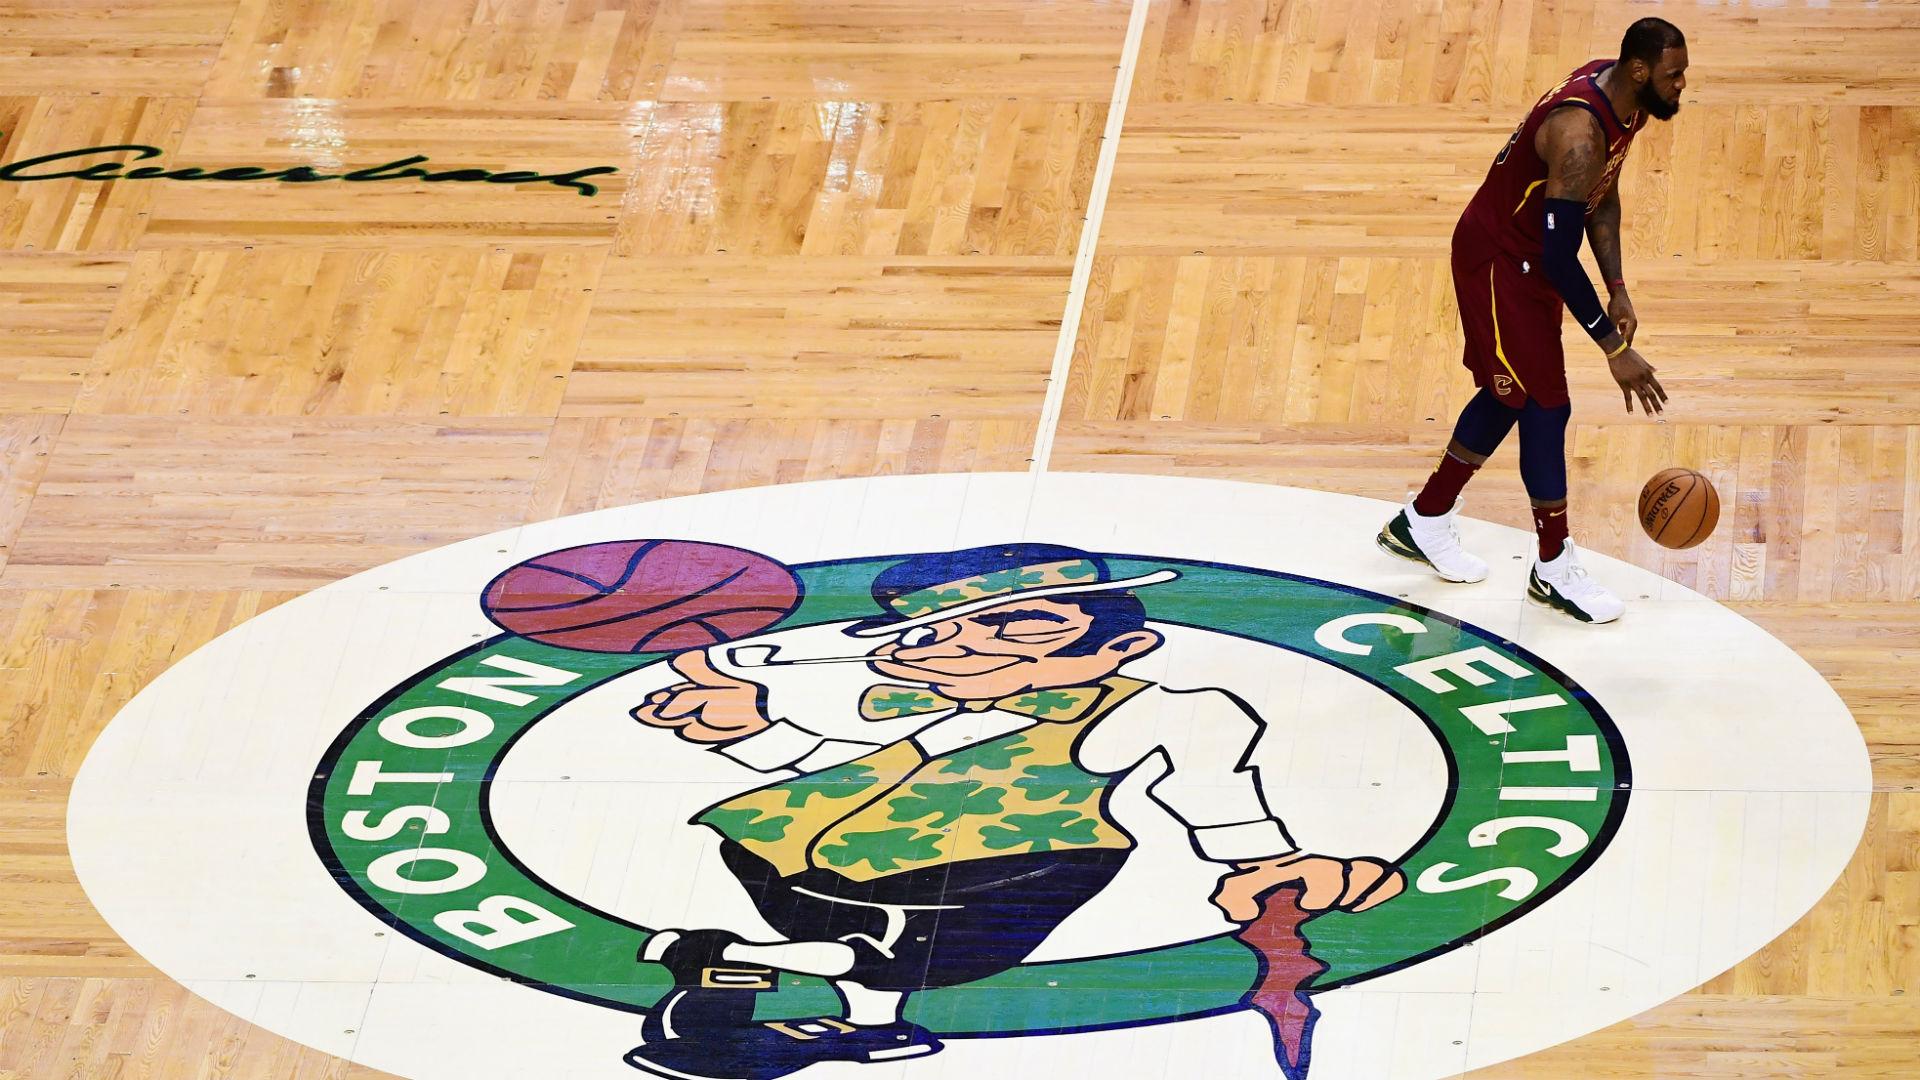 LeBron James drives Cavaliers past Celtics, 87-79, and into NBA Finals